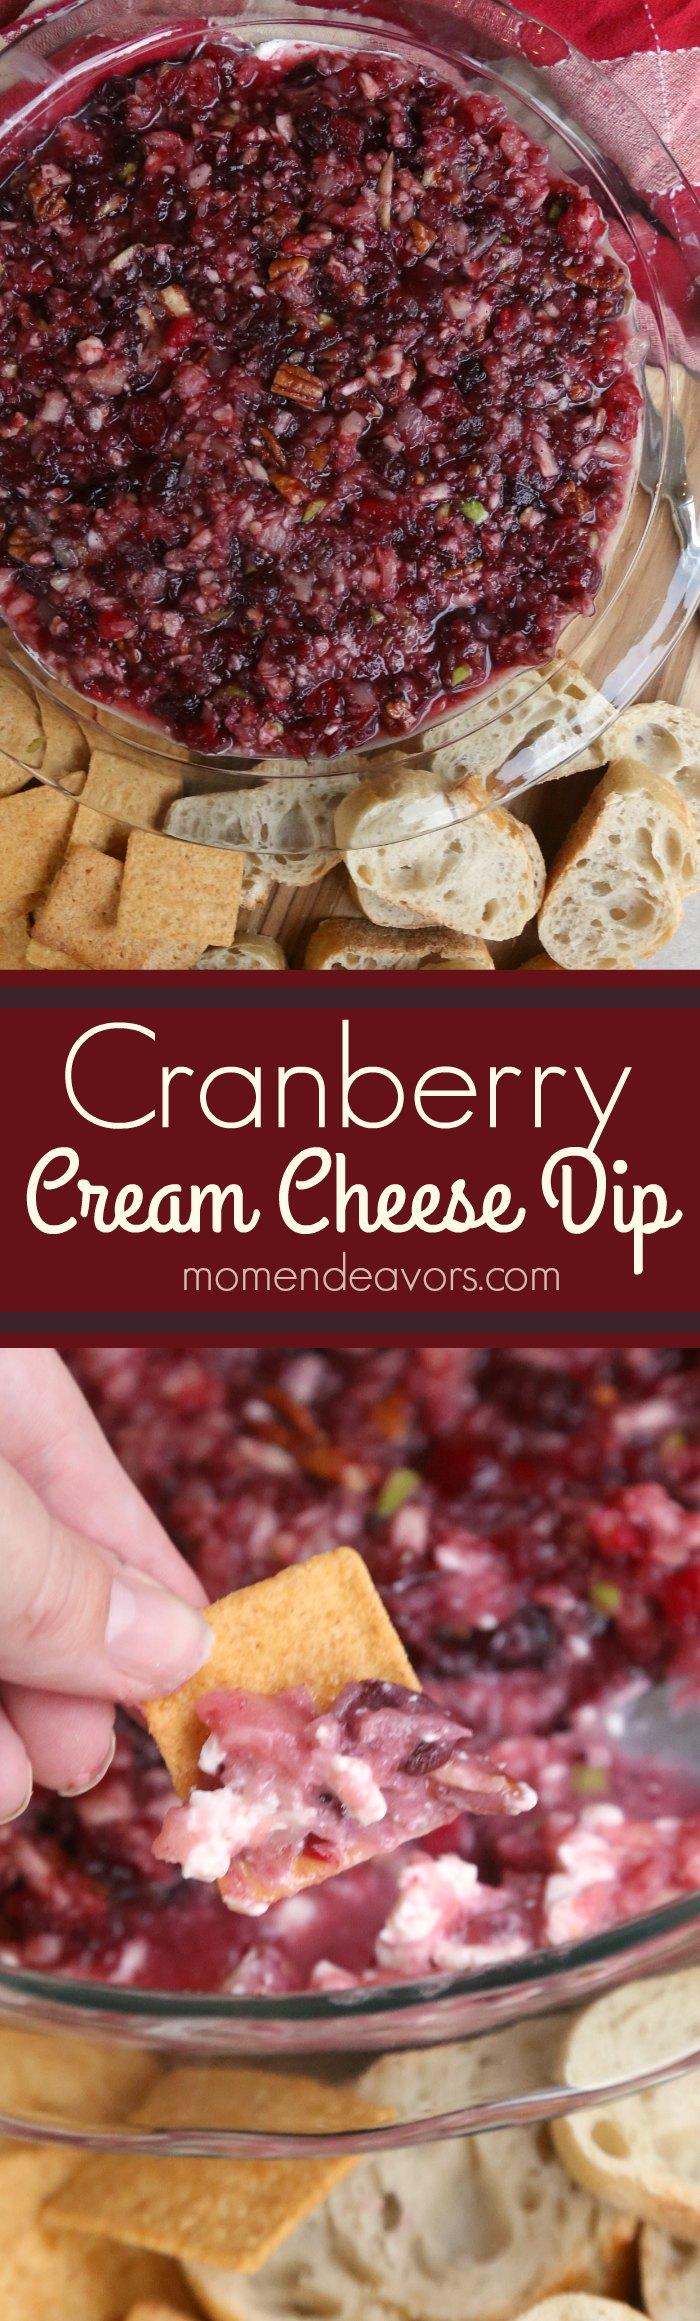 Cranberry Cream Cheese Dip Recipe